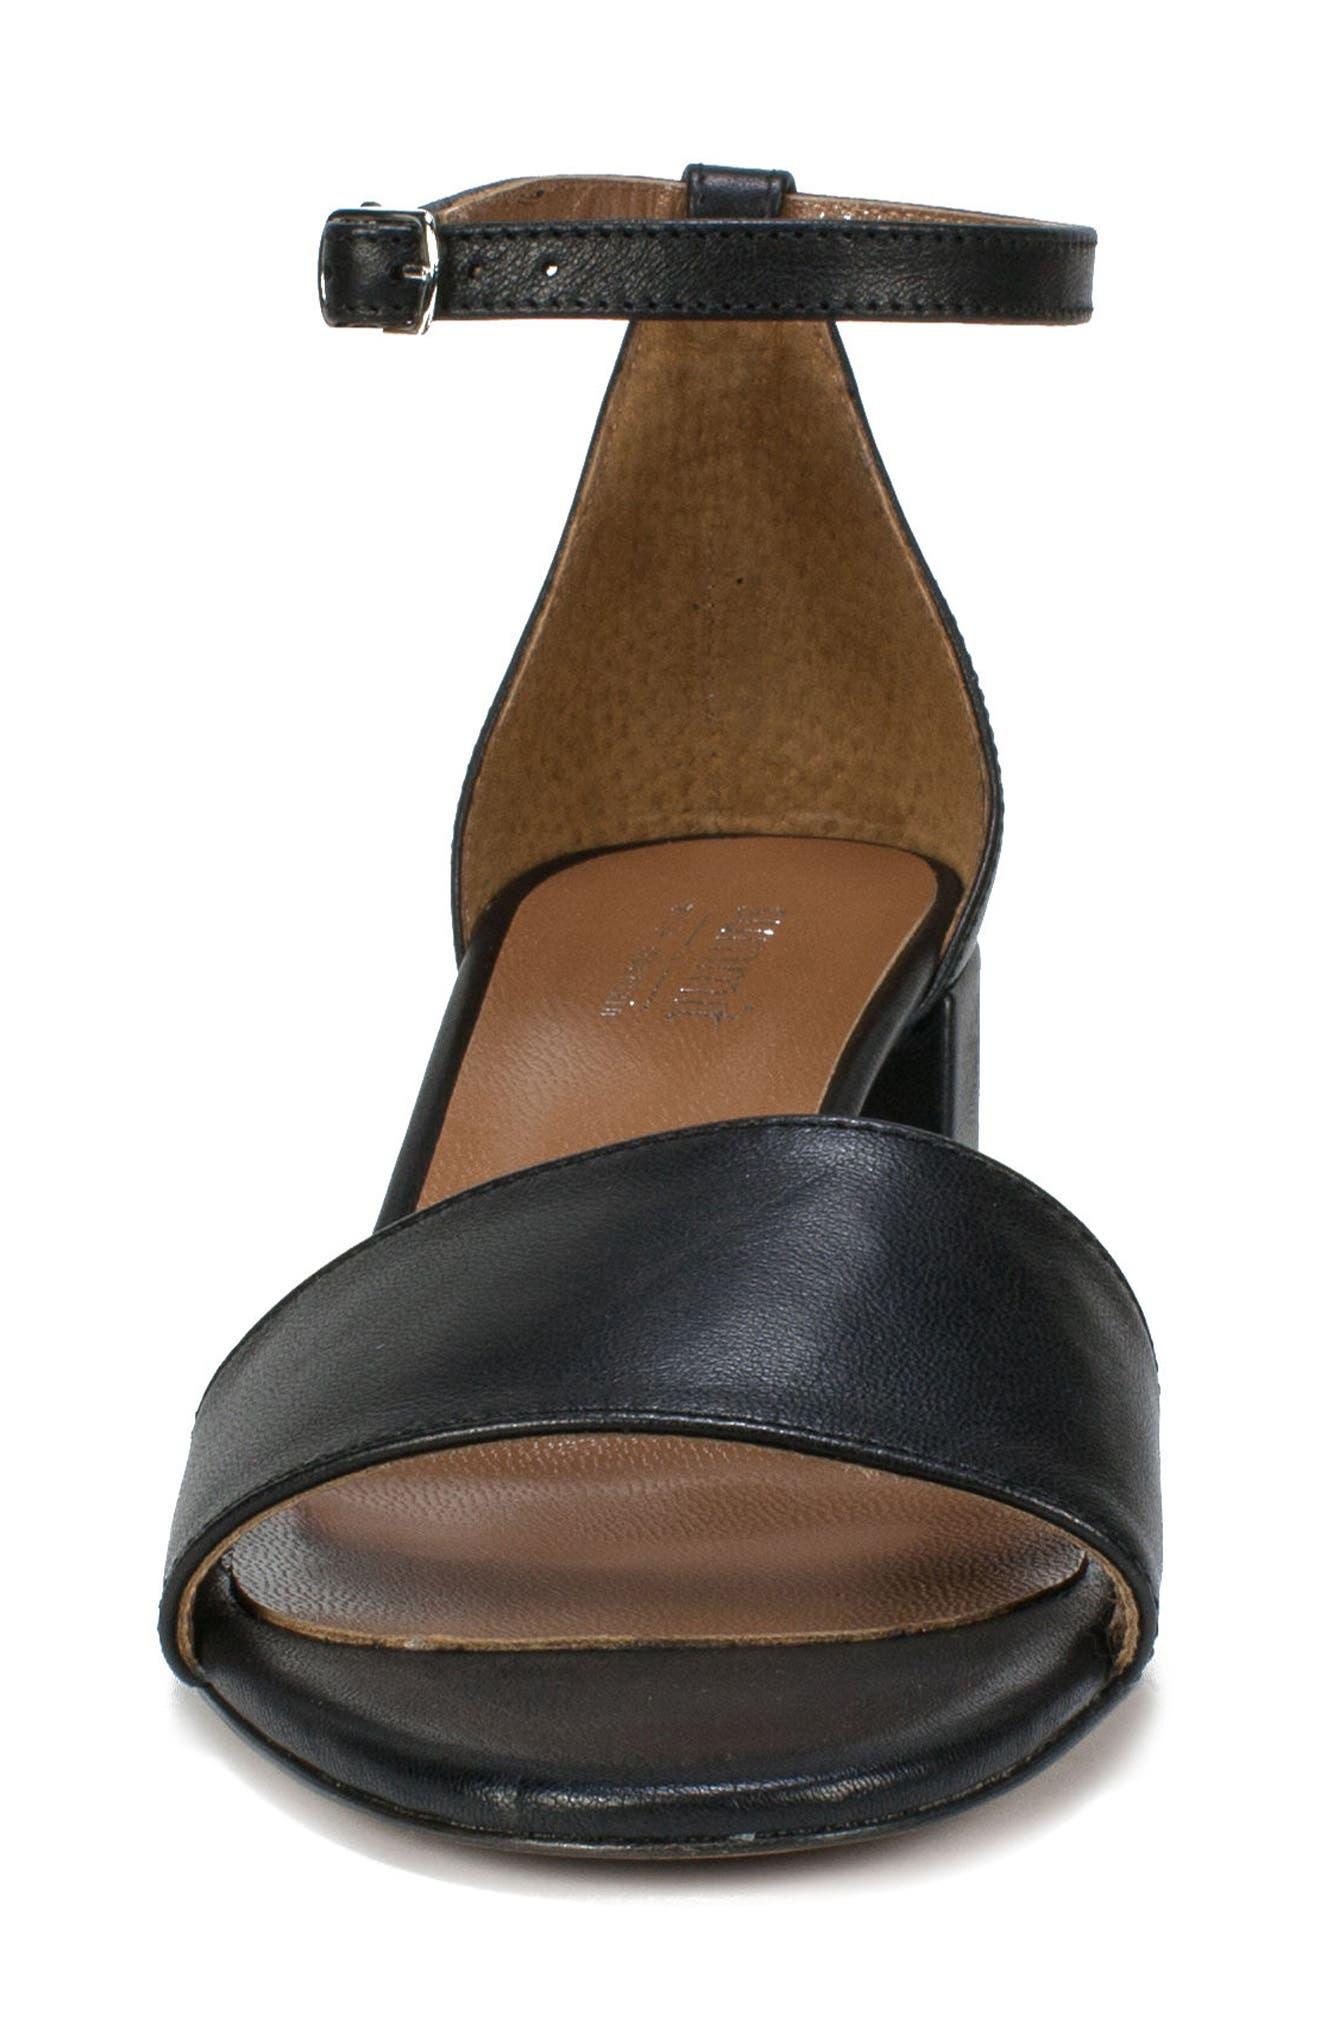 Ameila Block Heel Sandal,                             Alternate thumbnail 4, color,                             Black Leather